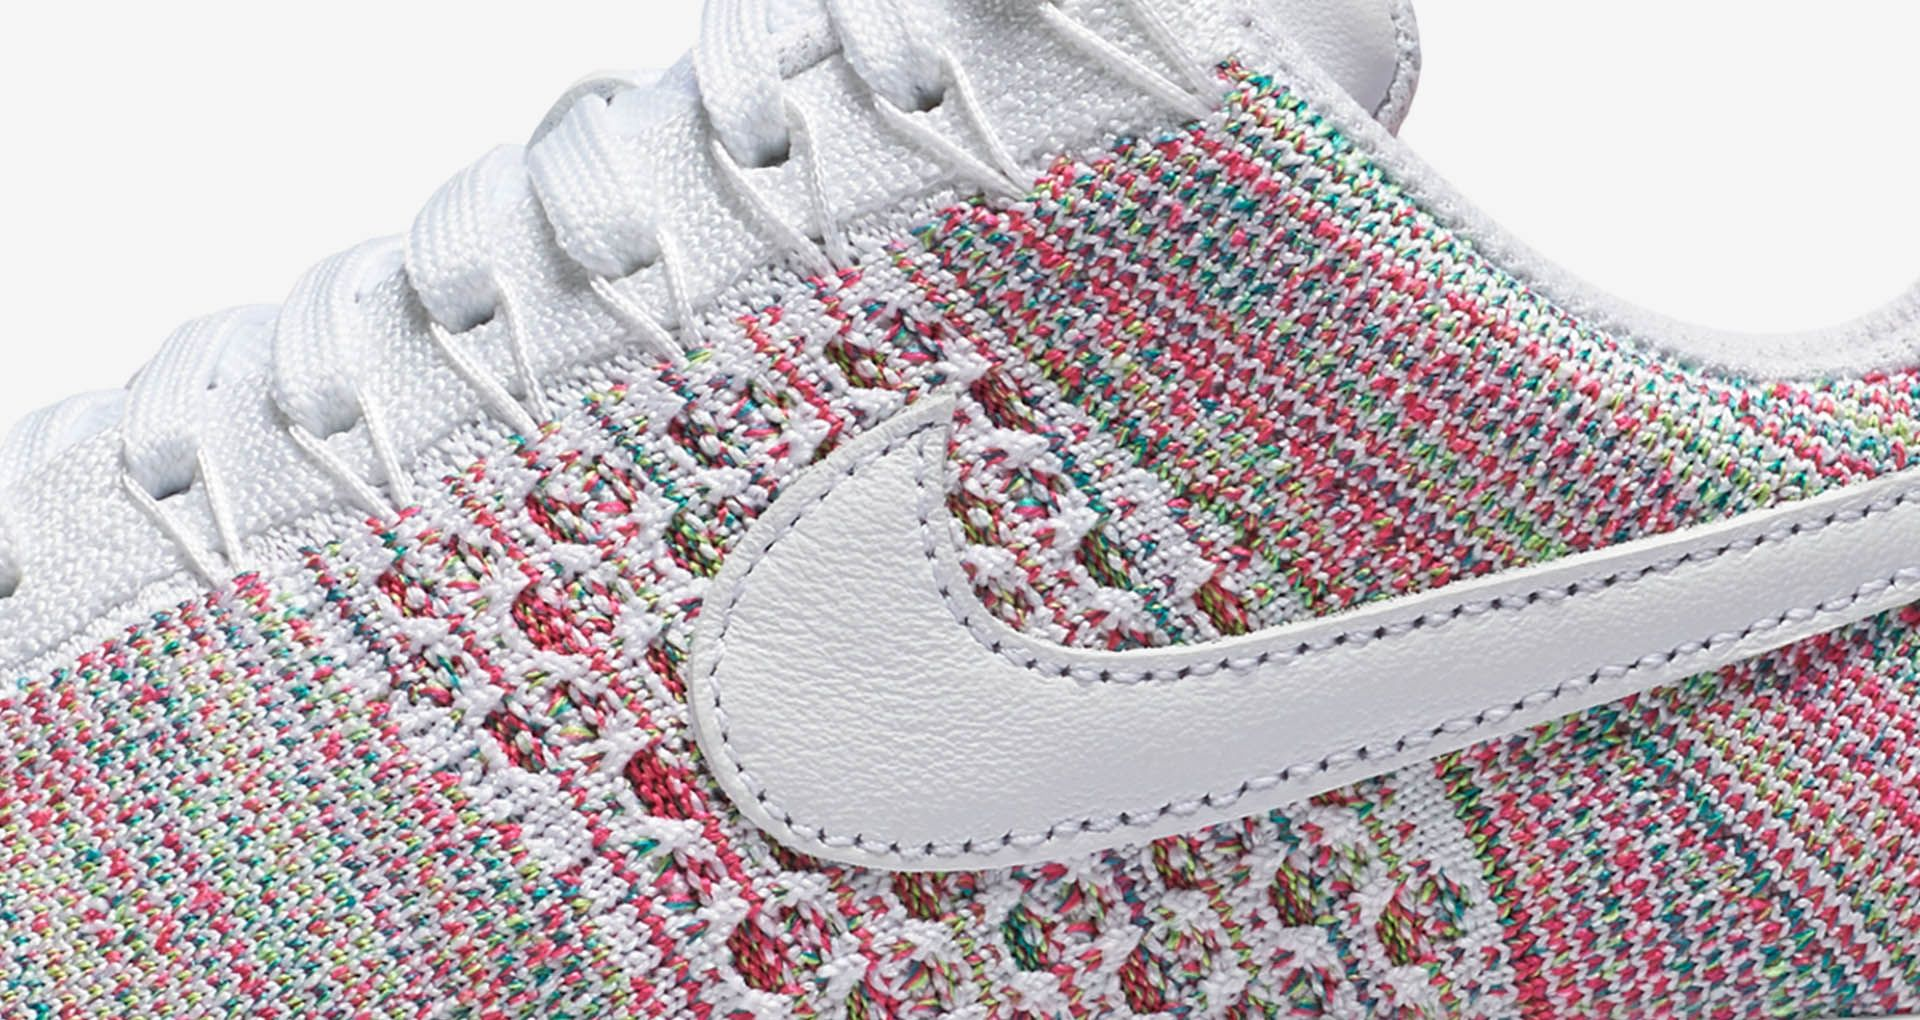 803e06a86531 Women s Nike Air Force 1 Ultra Flyknit Low  Radiant Emerald  Release Date